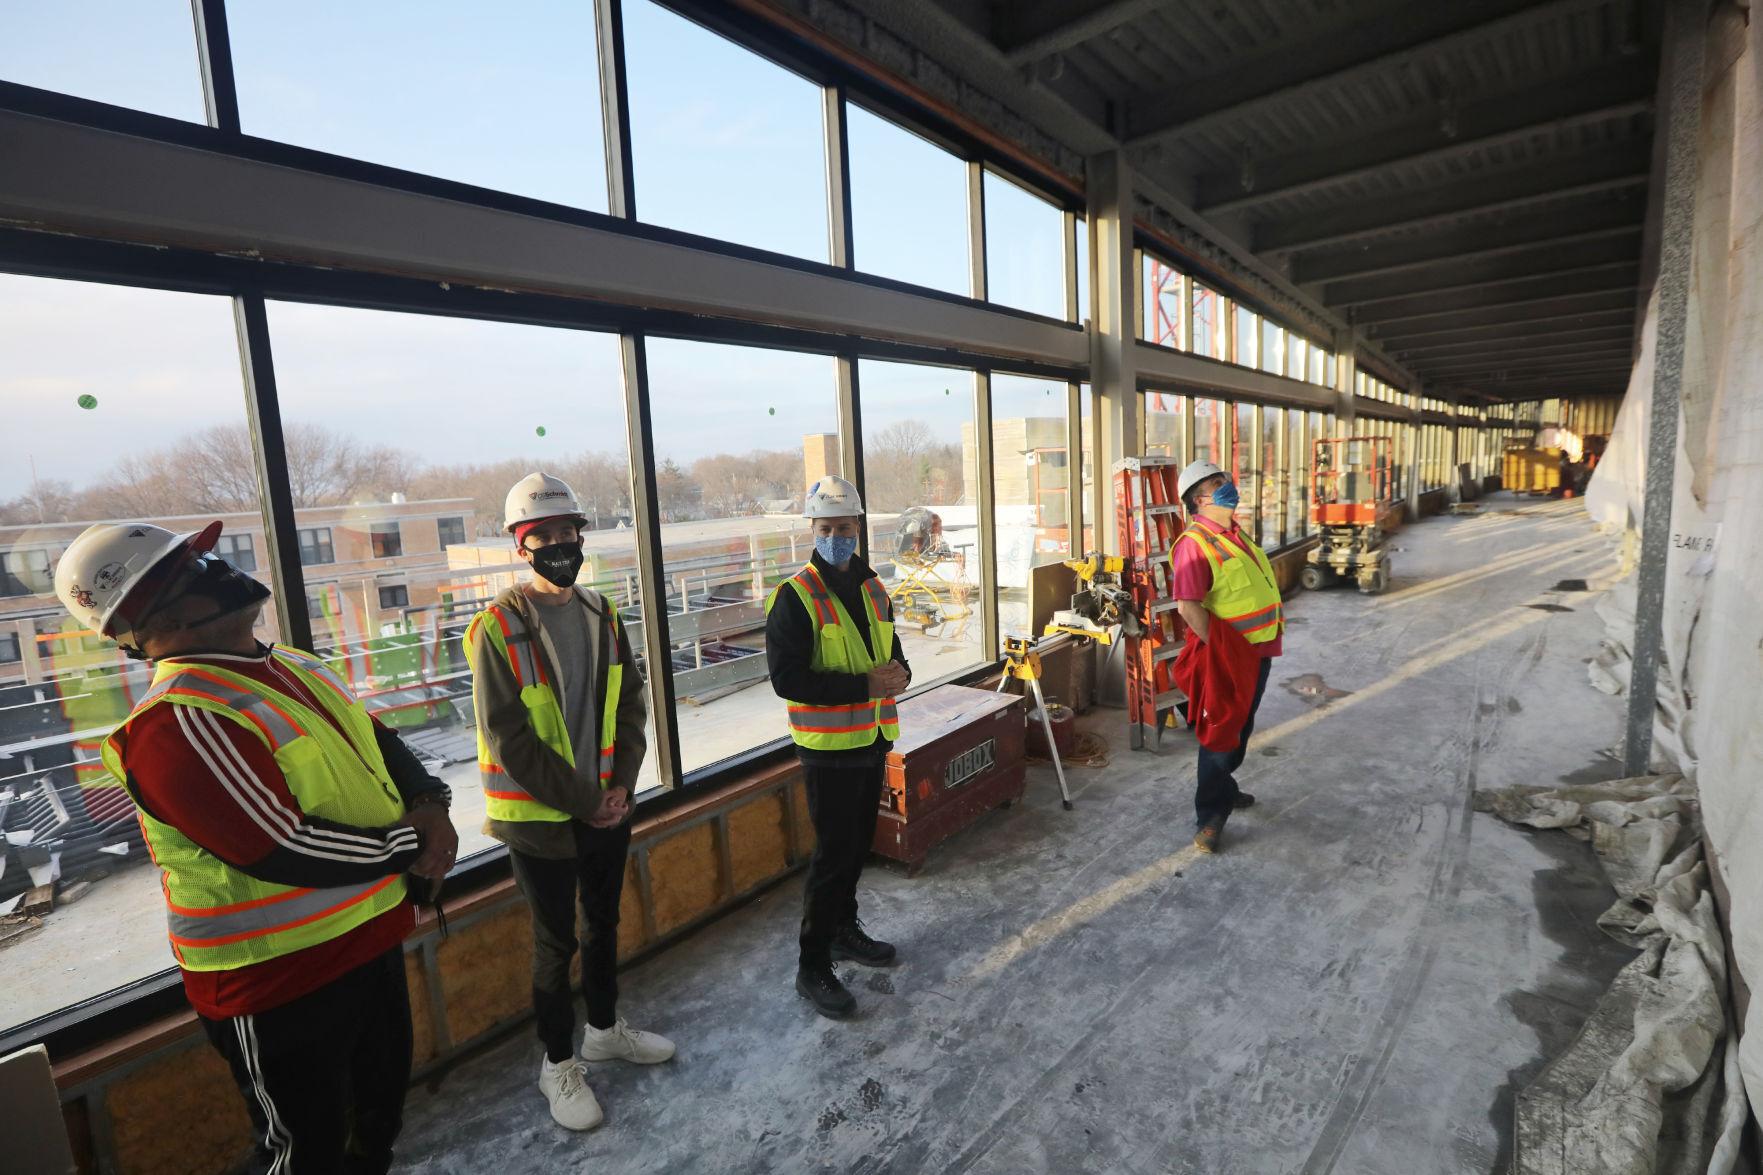 Madison Youth Arts Center - fourth floor